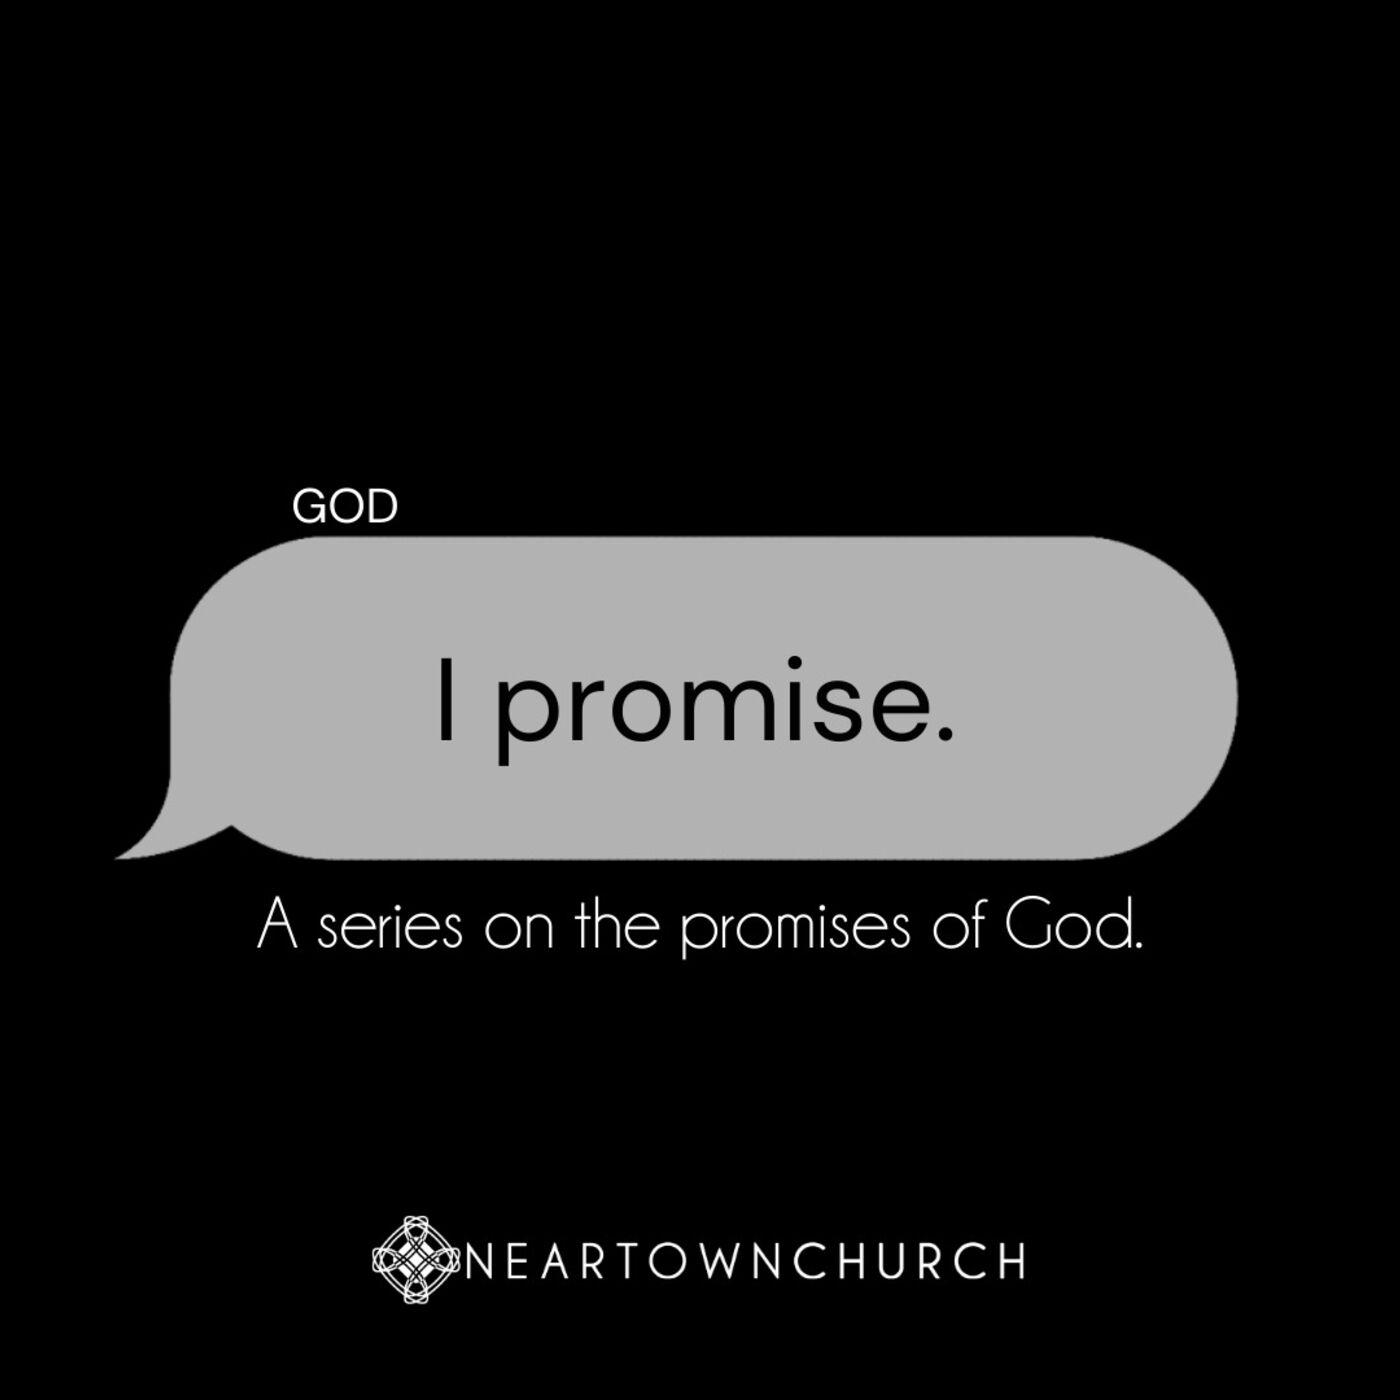 I promise. - 9.6.2020